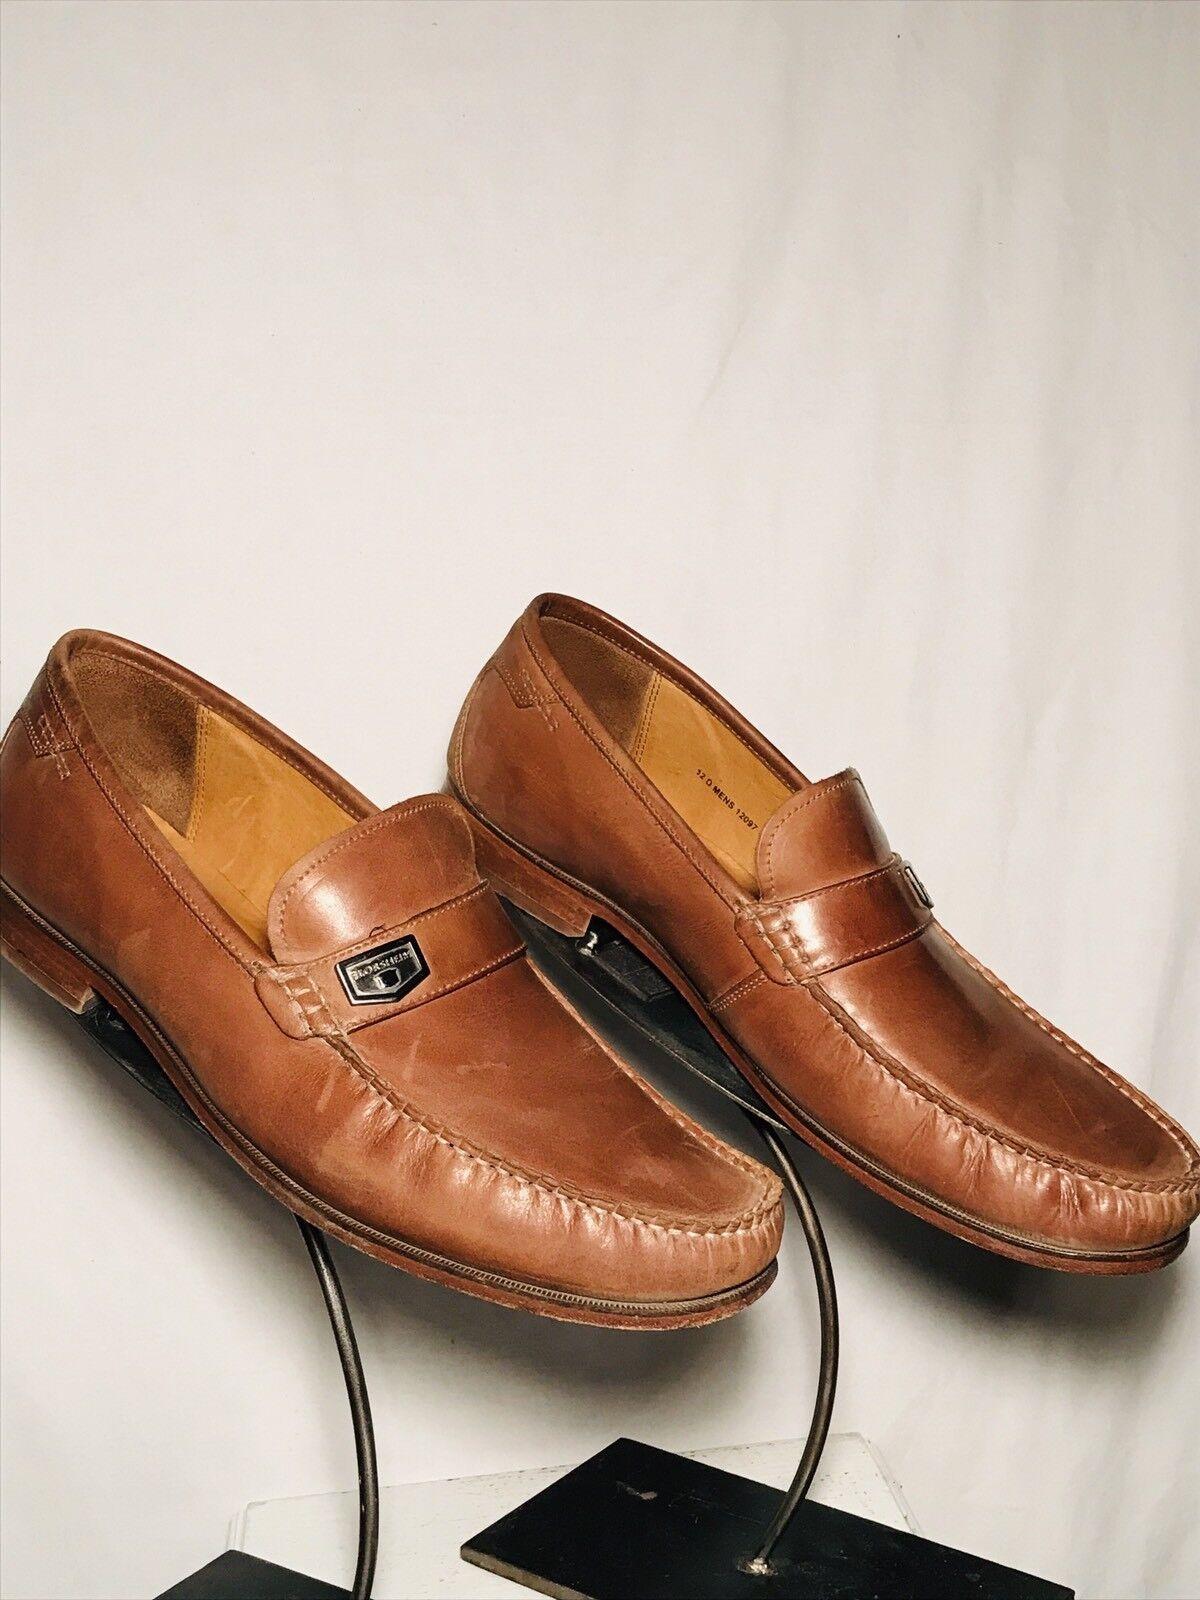 Florsheim Imperial Blrown Blrown Blrown Pelle Loafers Uomo Size 12D fd82b5